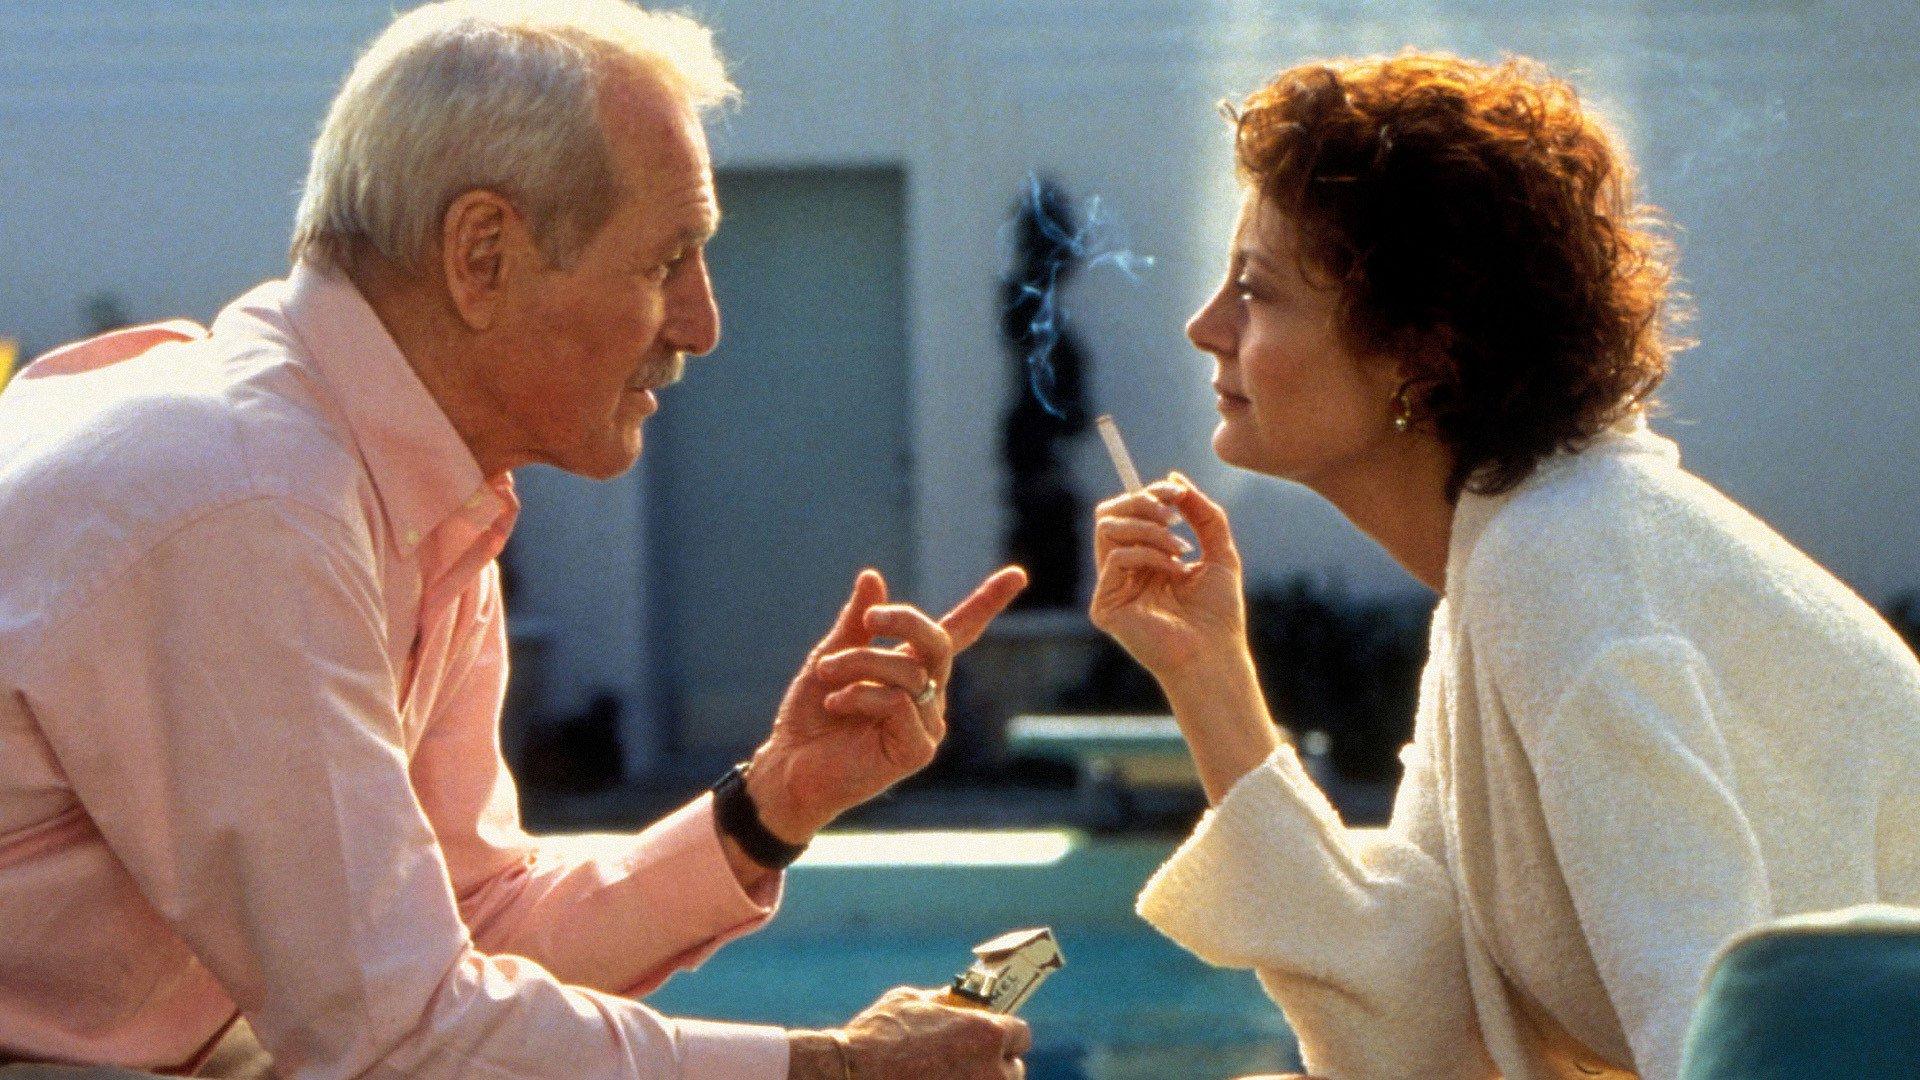 Paul Newman and Susan Sarandon in Twilight